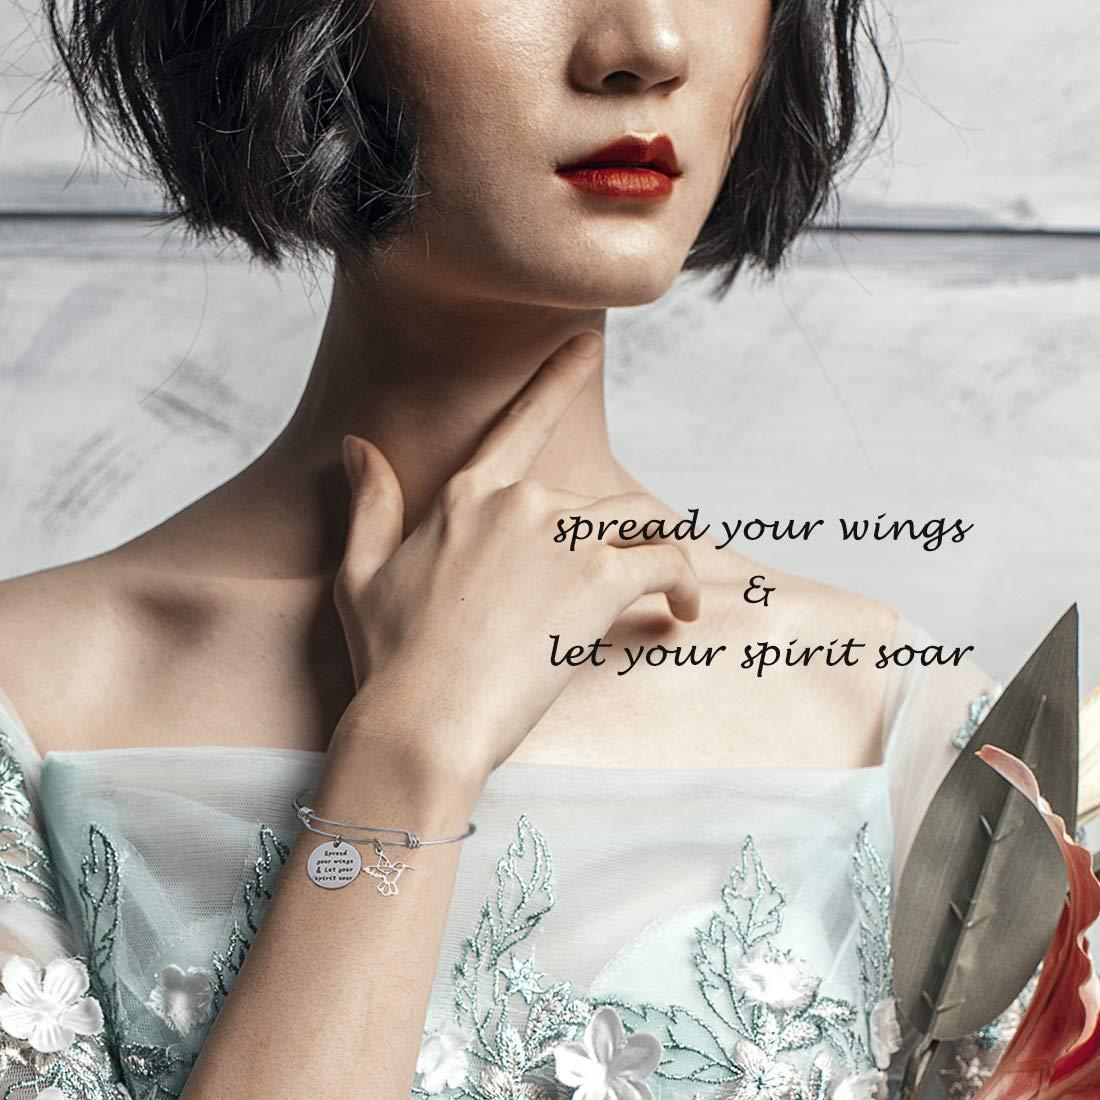 HOLLP Humming Bird Charm Bracelet Humming Bird Lover Gift Spread Your Wings /& Let Your Spirit Soar Bracelet